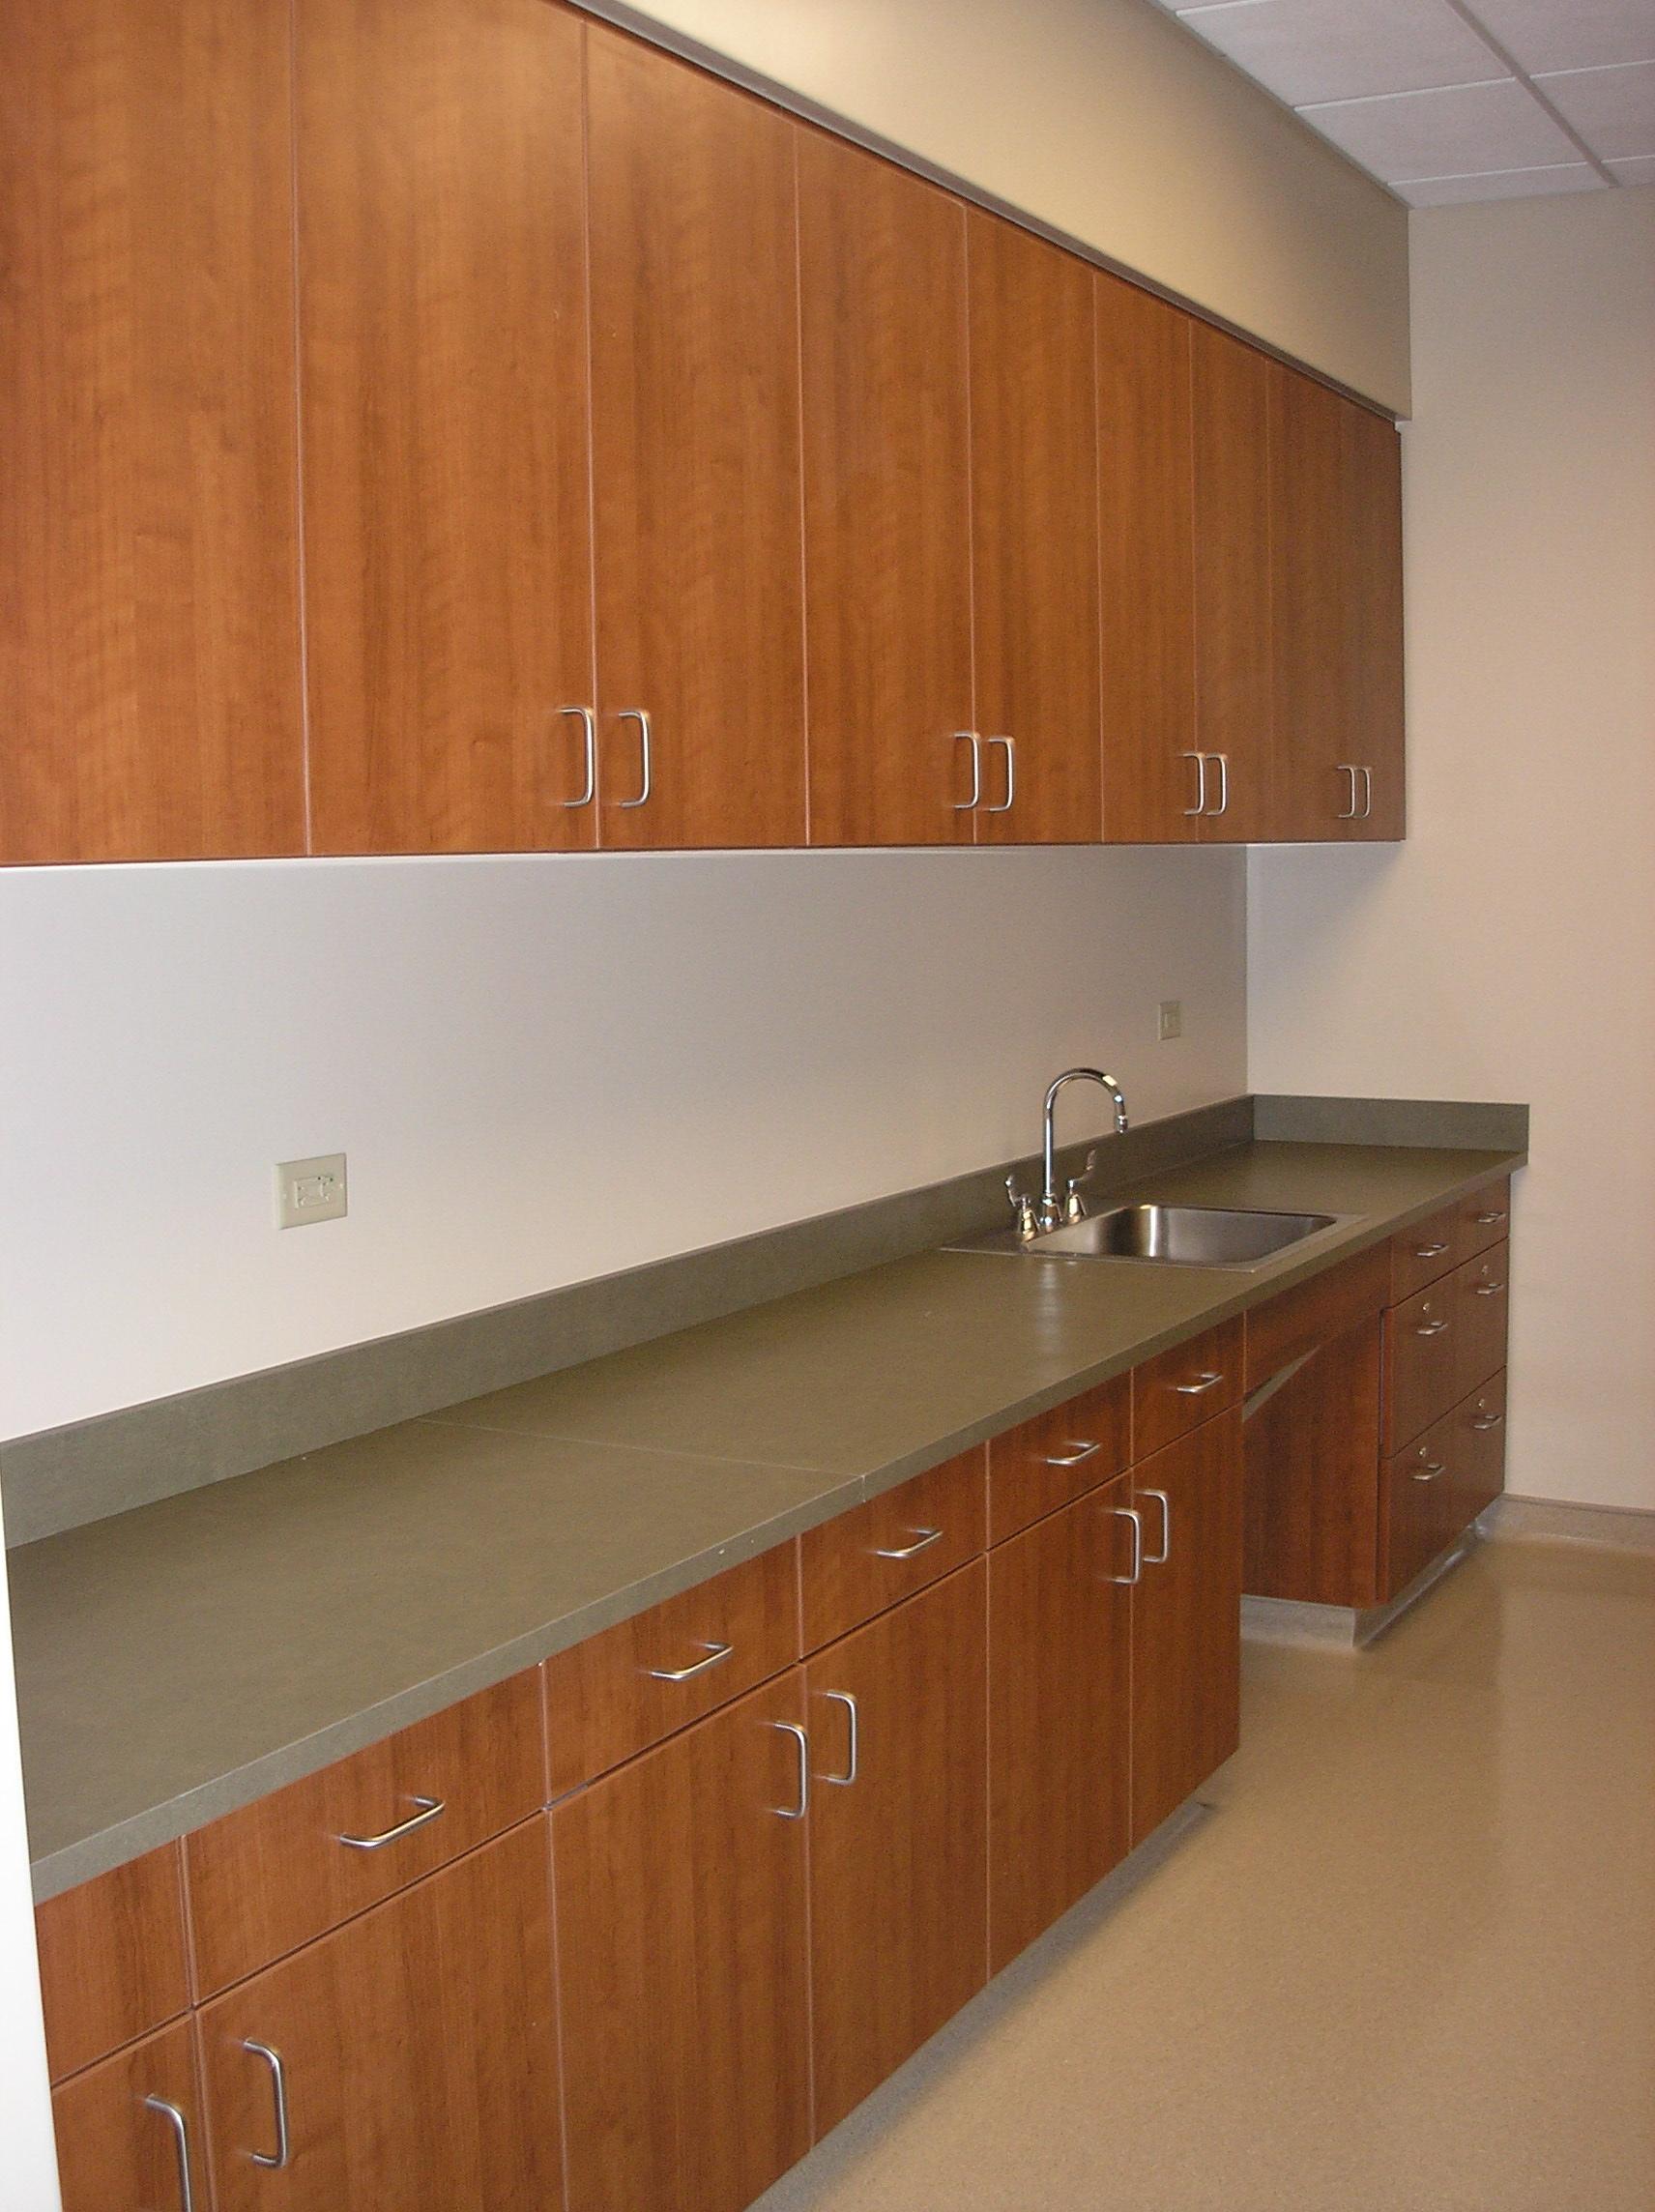 Frisco hospital 9.JPG